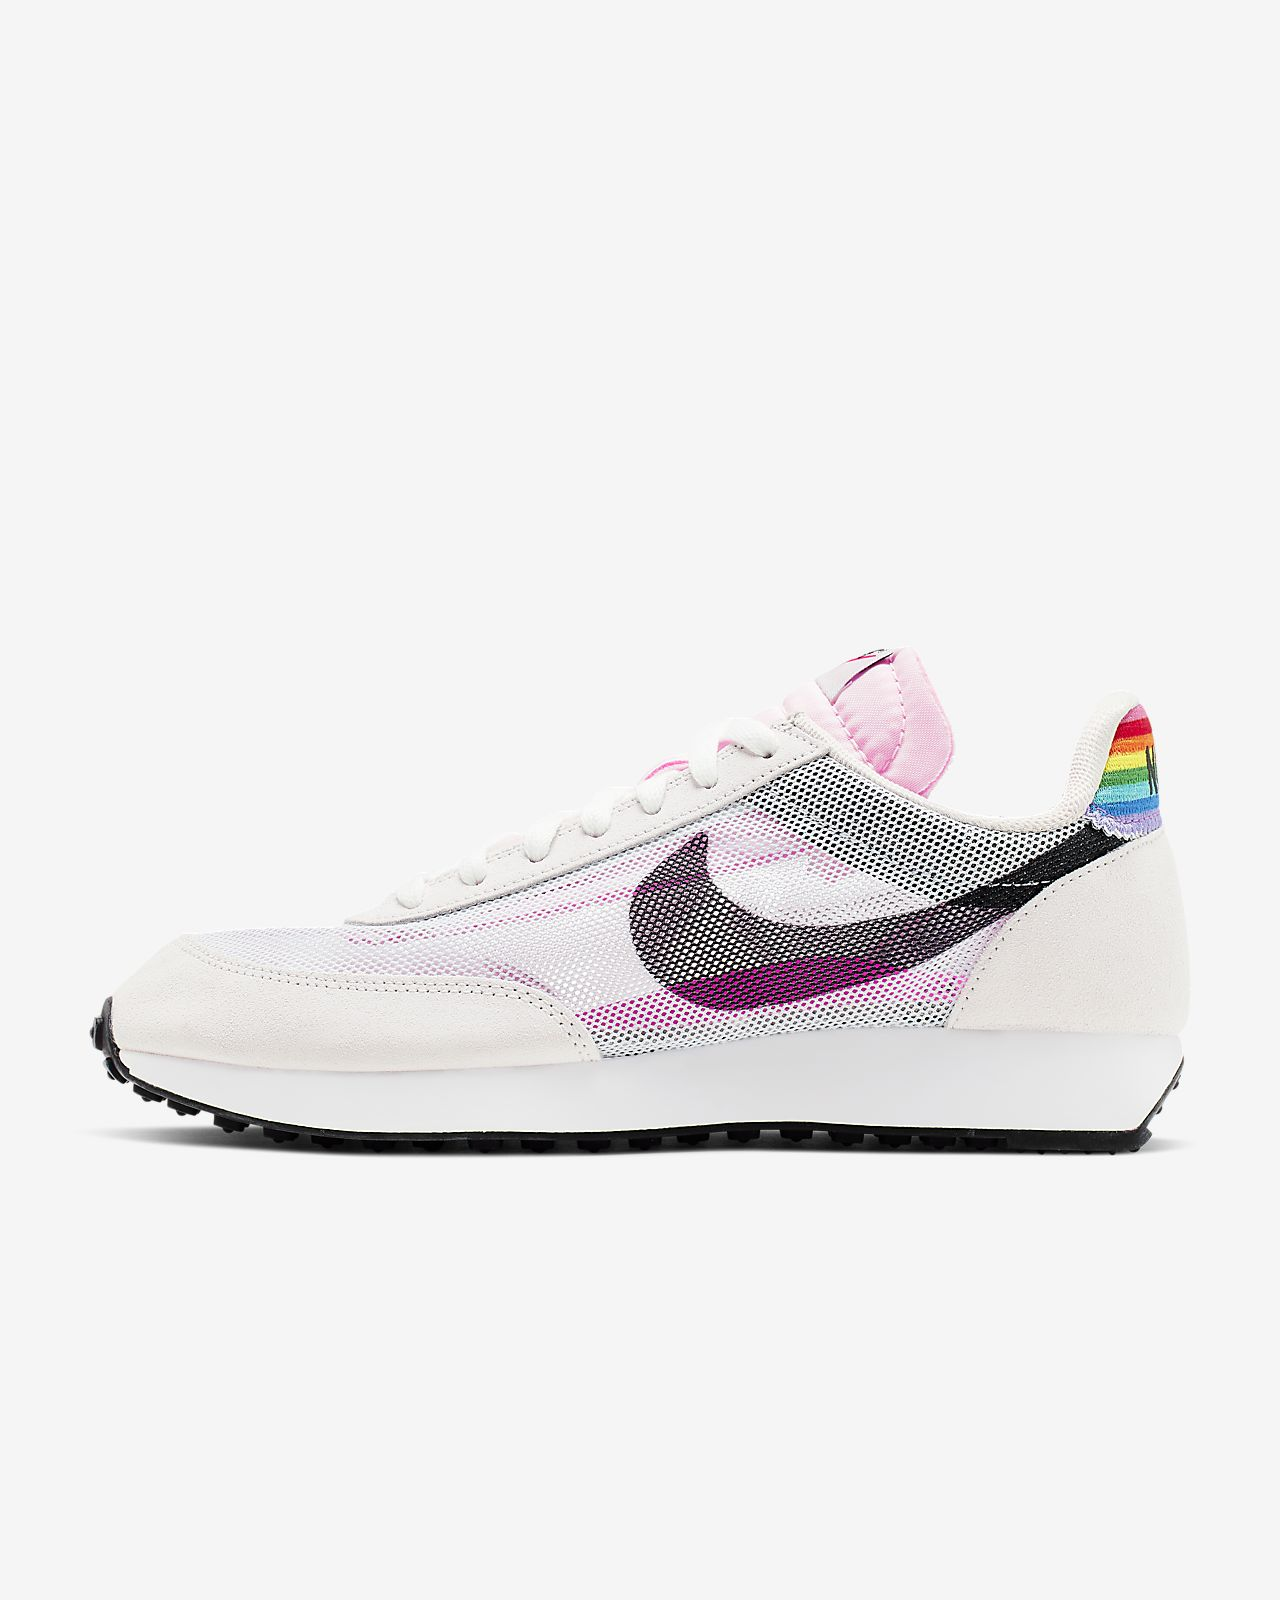 Nike Air Tailwind 79 BETRUE Schoen